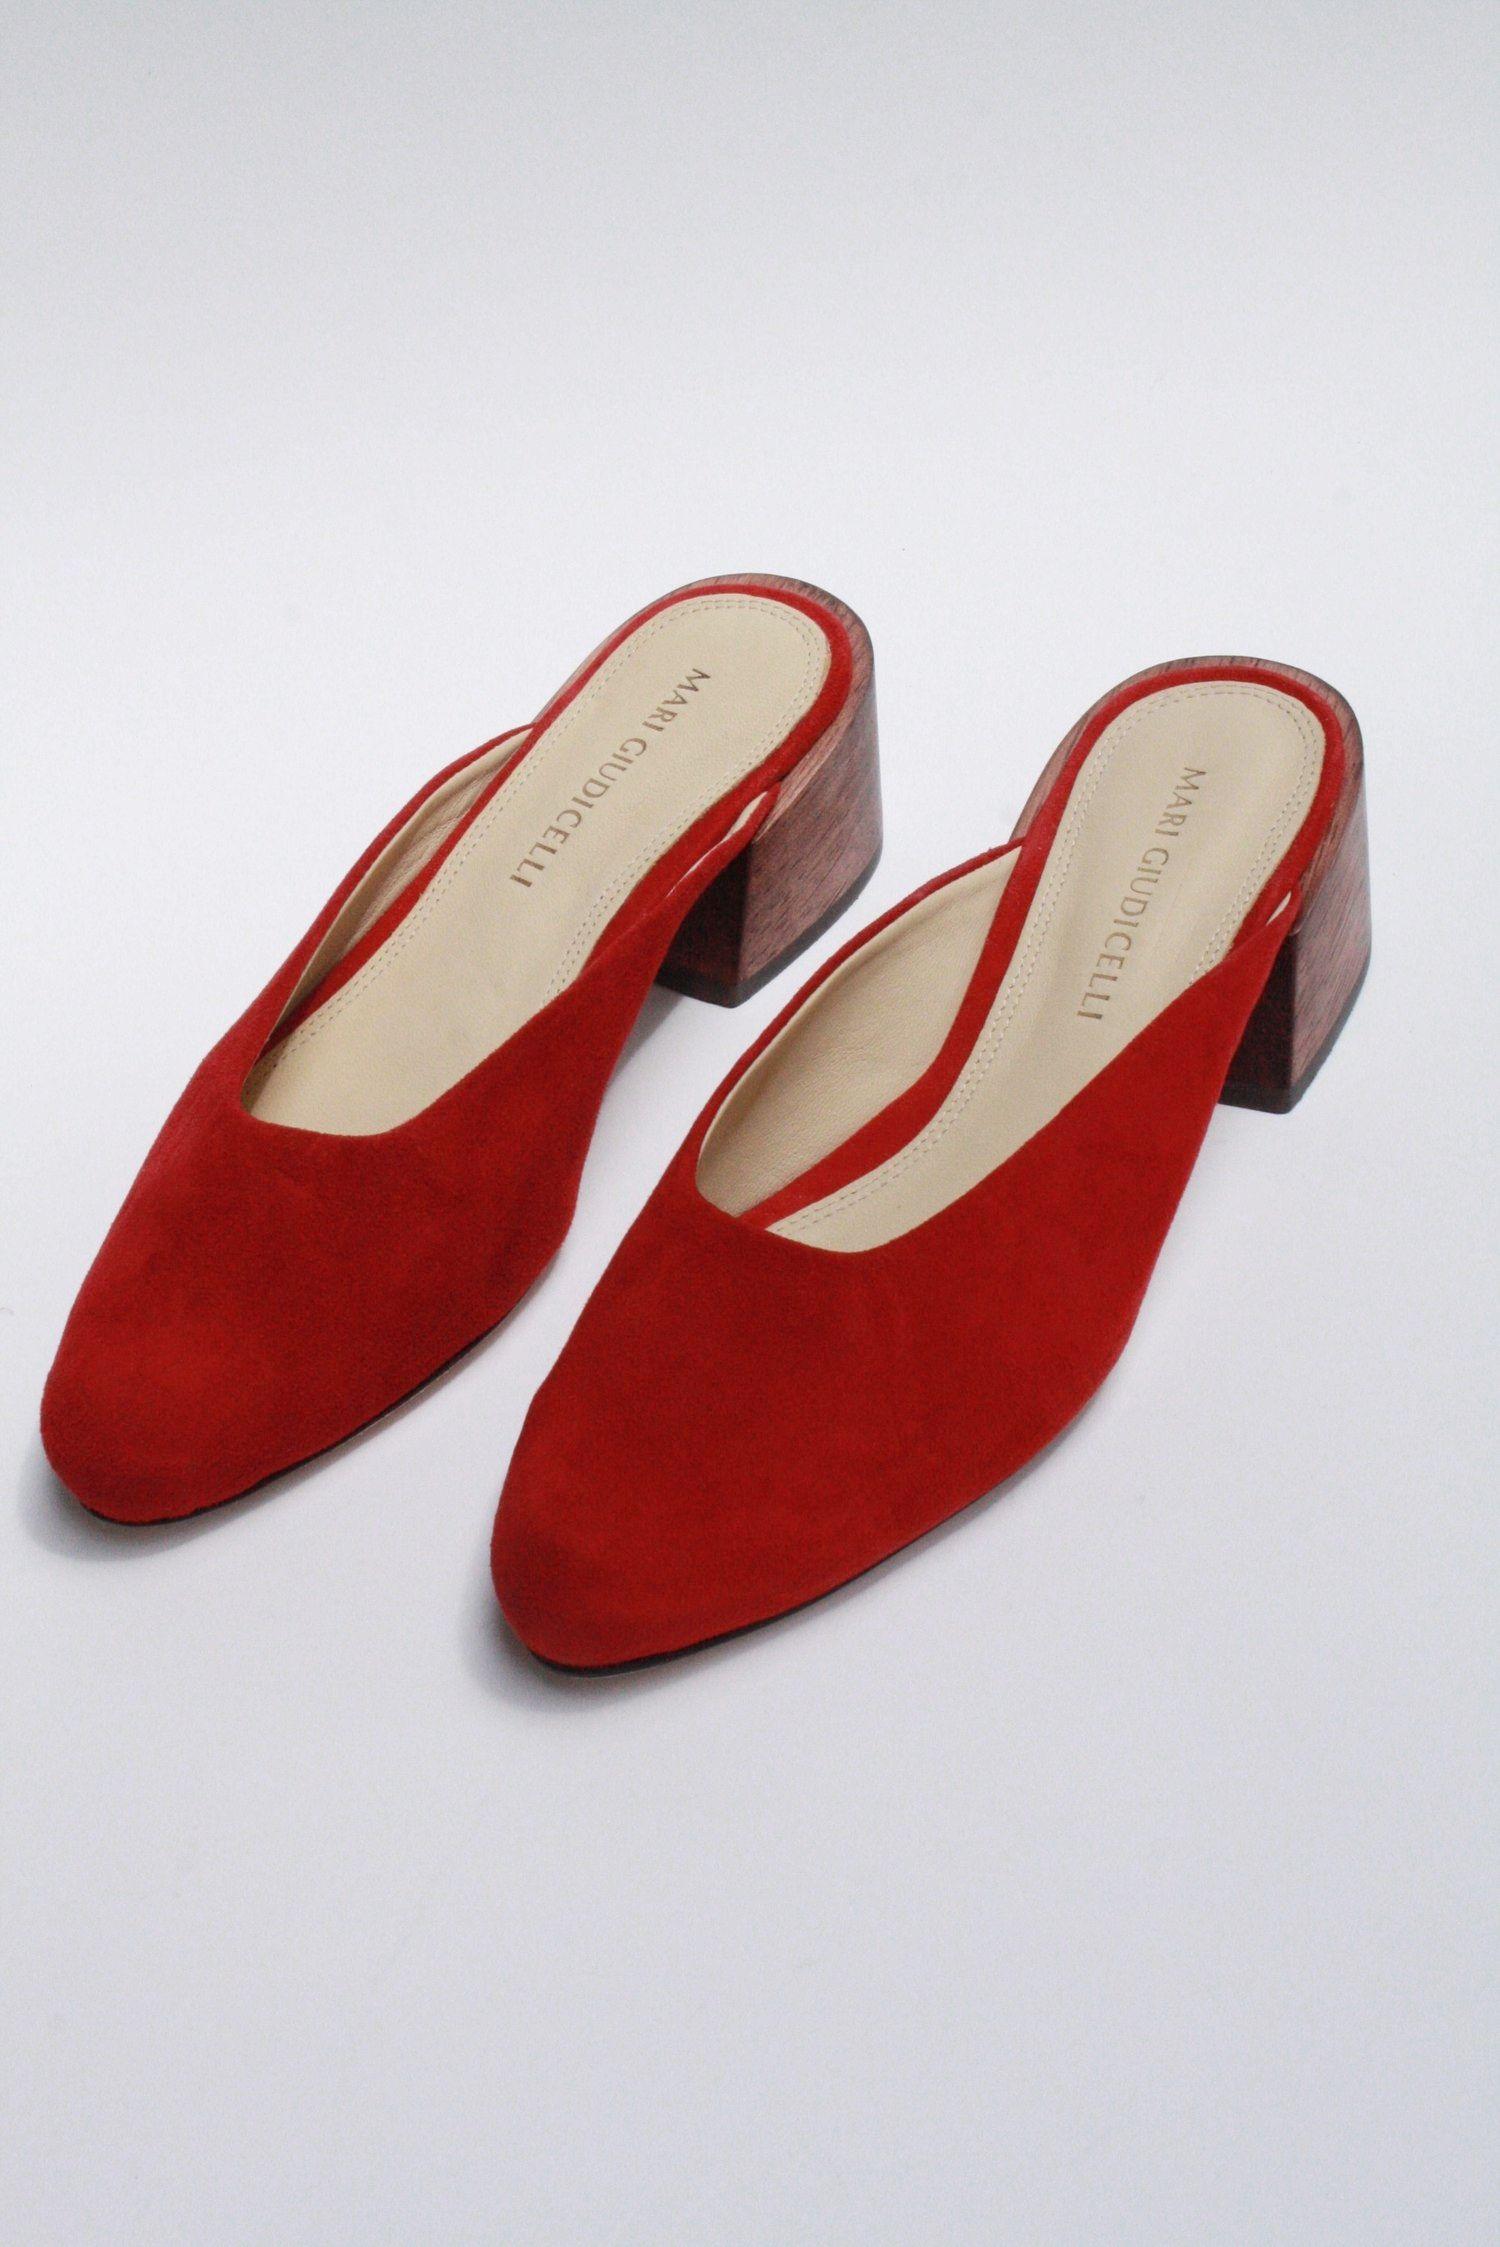 big sale cheap online Red 'Lisa' mule slippers sale good selling cheap discounts hot sale online gGa35Jq8r